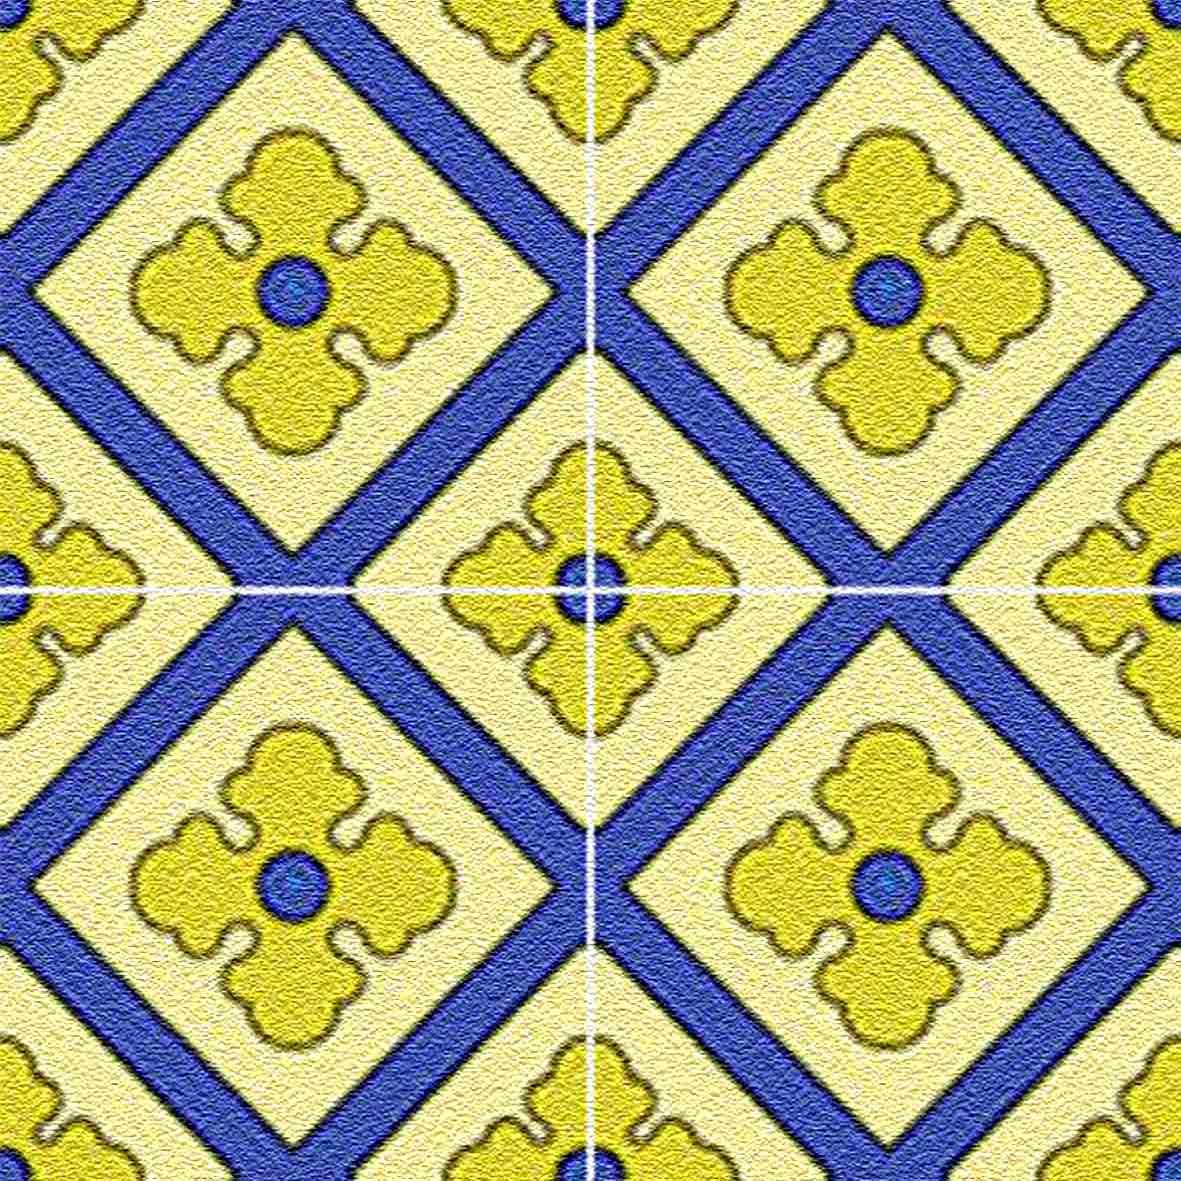 Adesivo para Azulejo Ladrilho Hidráulico Mosaico Moderno Vinil 15x15cm 16 peças Cosi Dimora